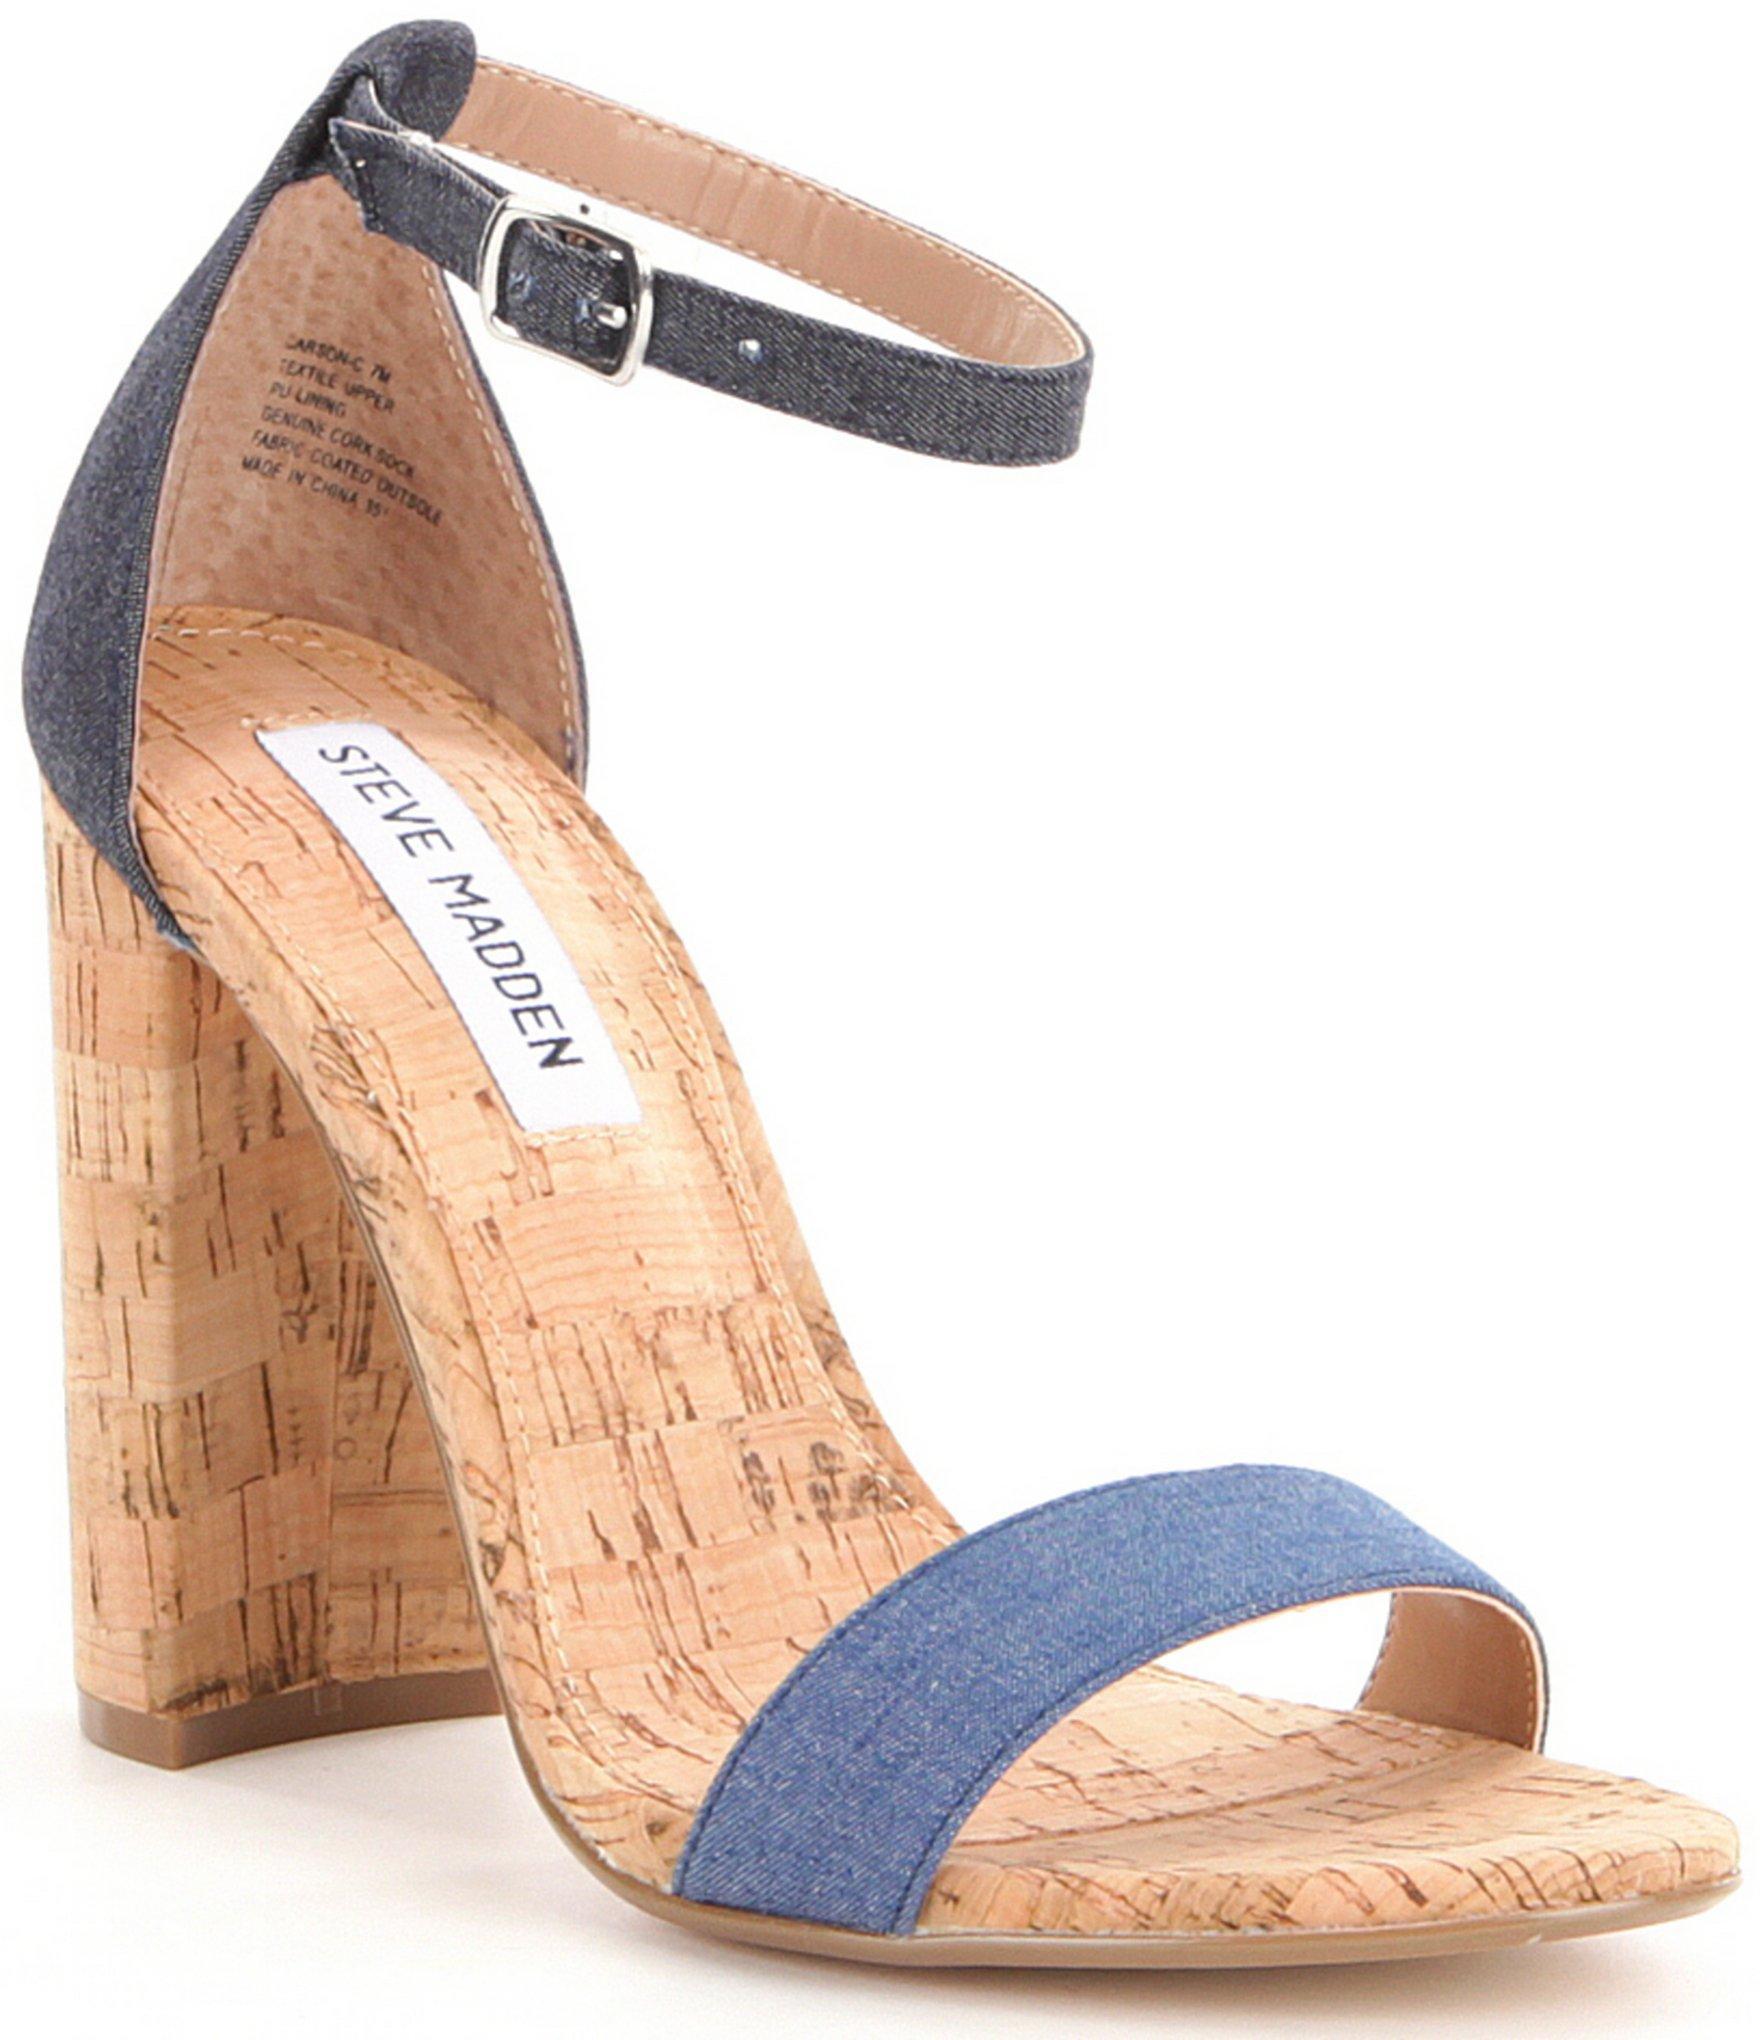 cd12973747b Lyst - Steve Madden Carson Cork Denim Fabric Dress Sandals in Blue